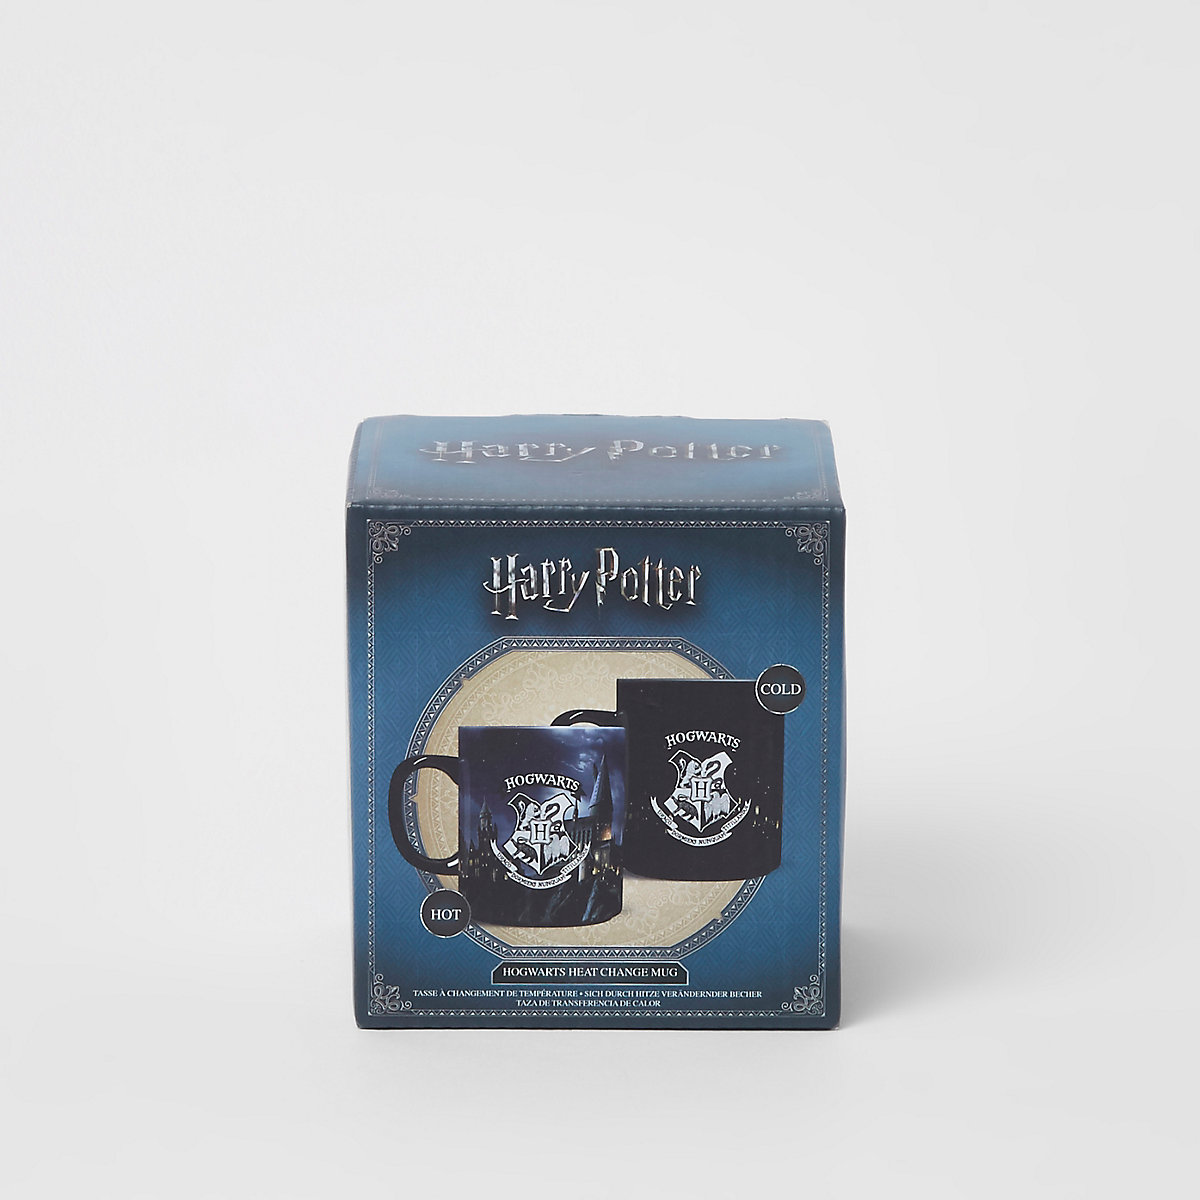 Blue Harry Potter heat change mug